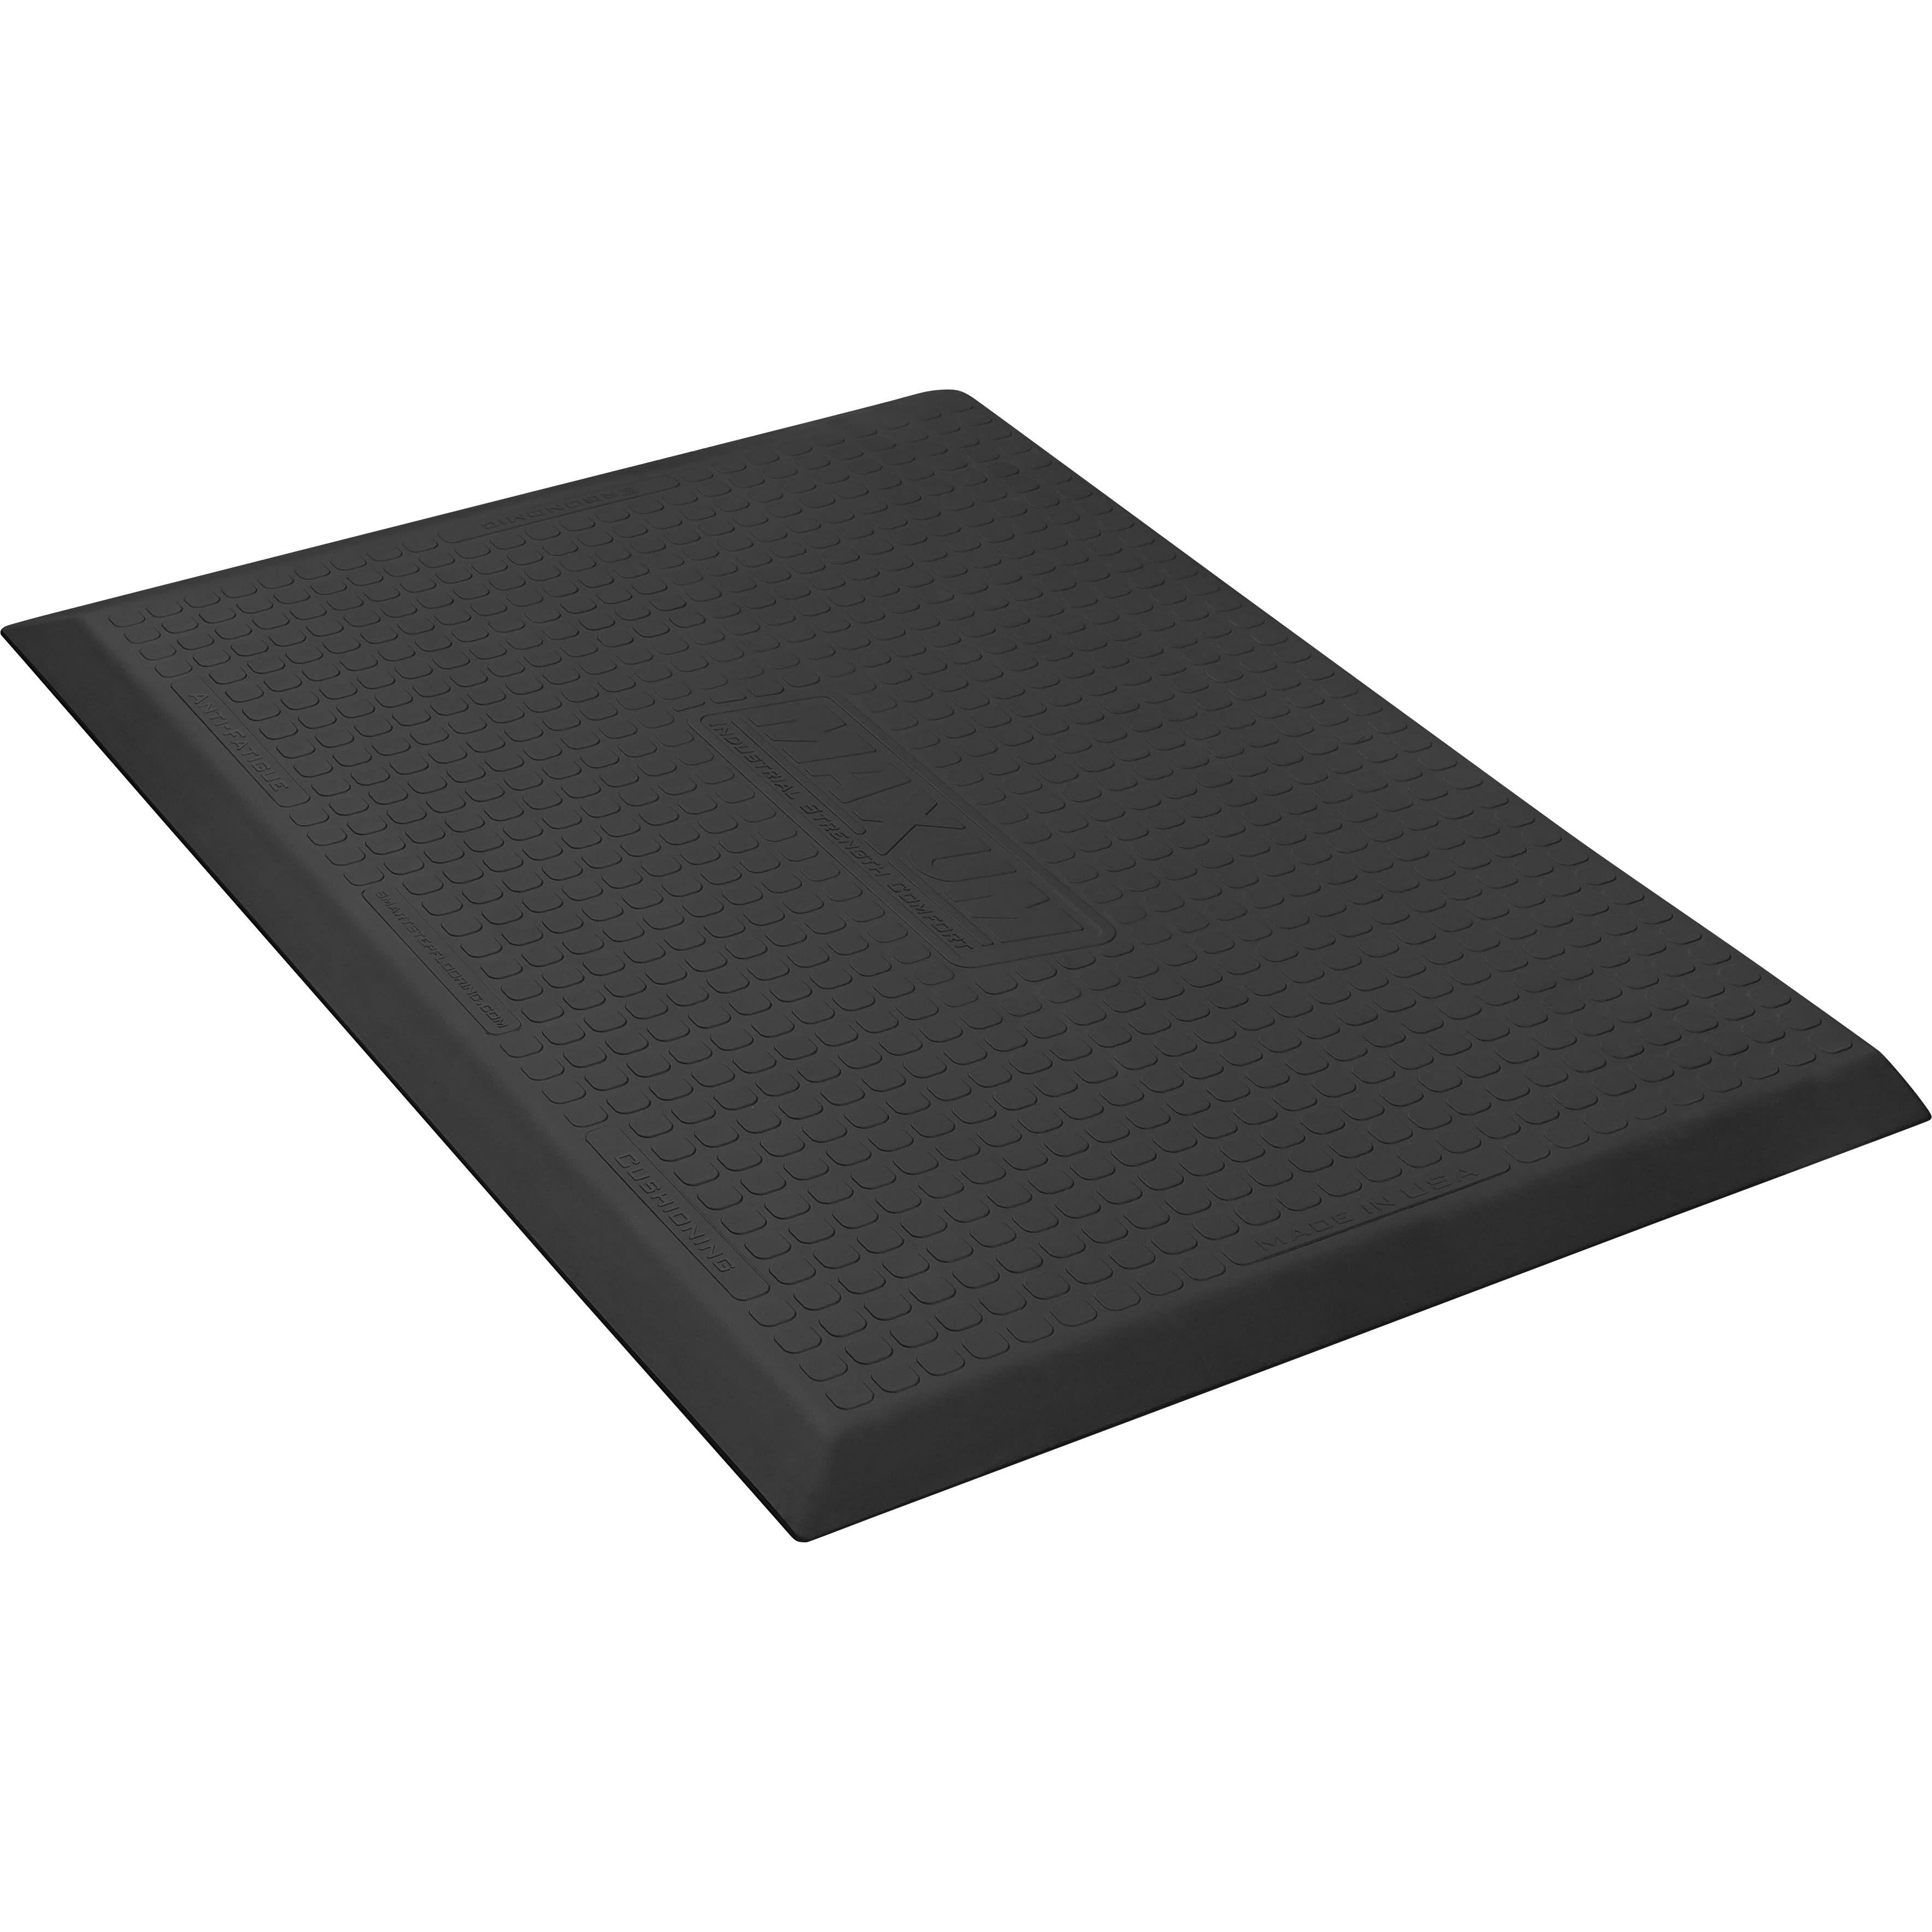 Wellness Mats MXR32BLK Maxum Mat w/ No-Trip Beveled Edge & Non-Slip Material, 3x2-ft, Black